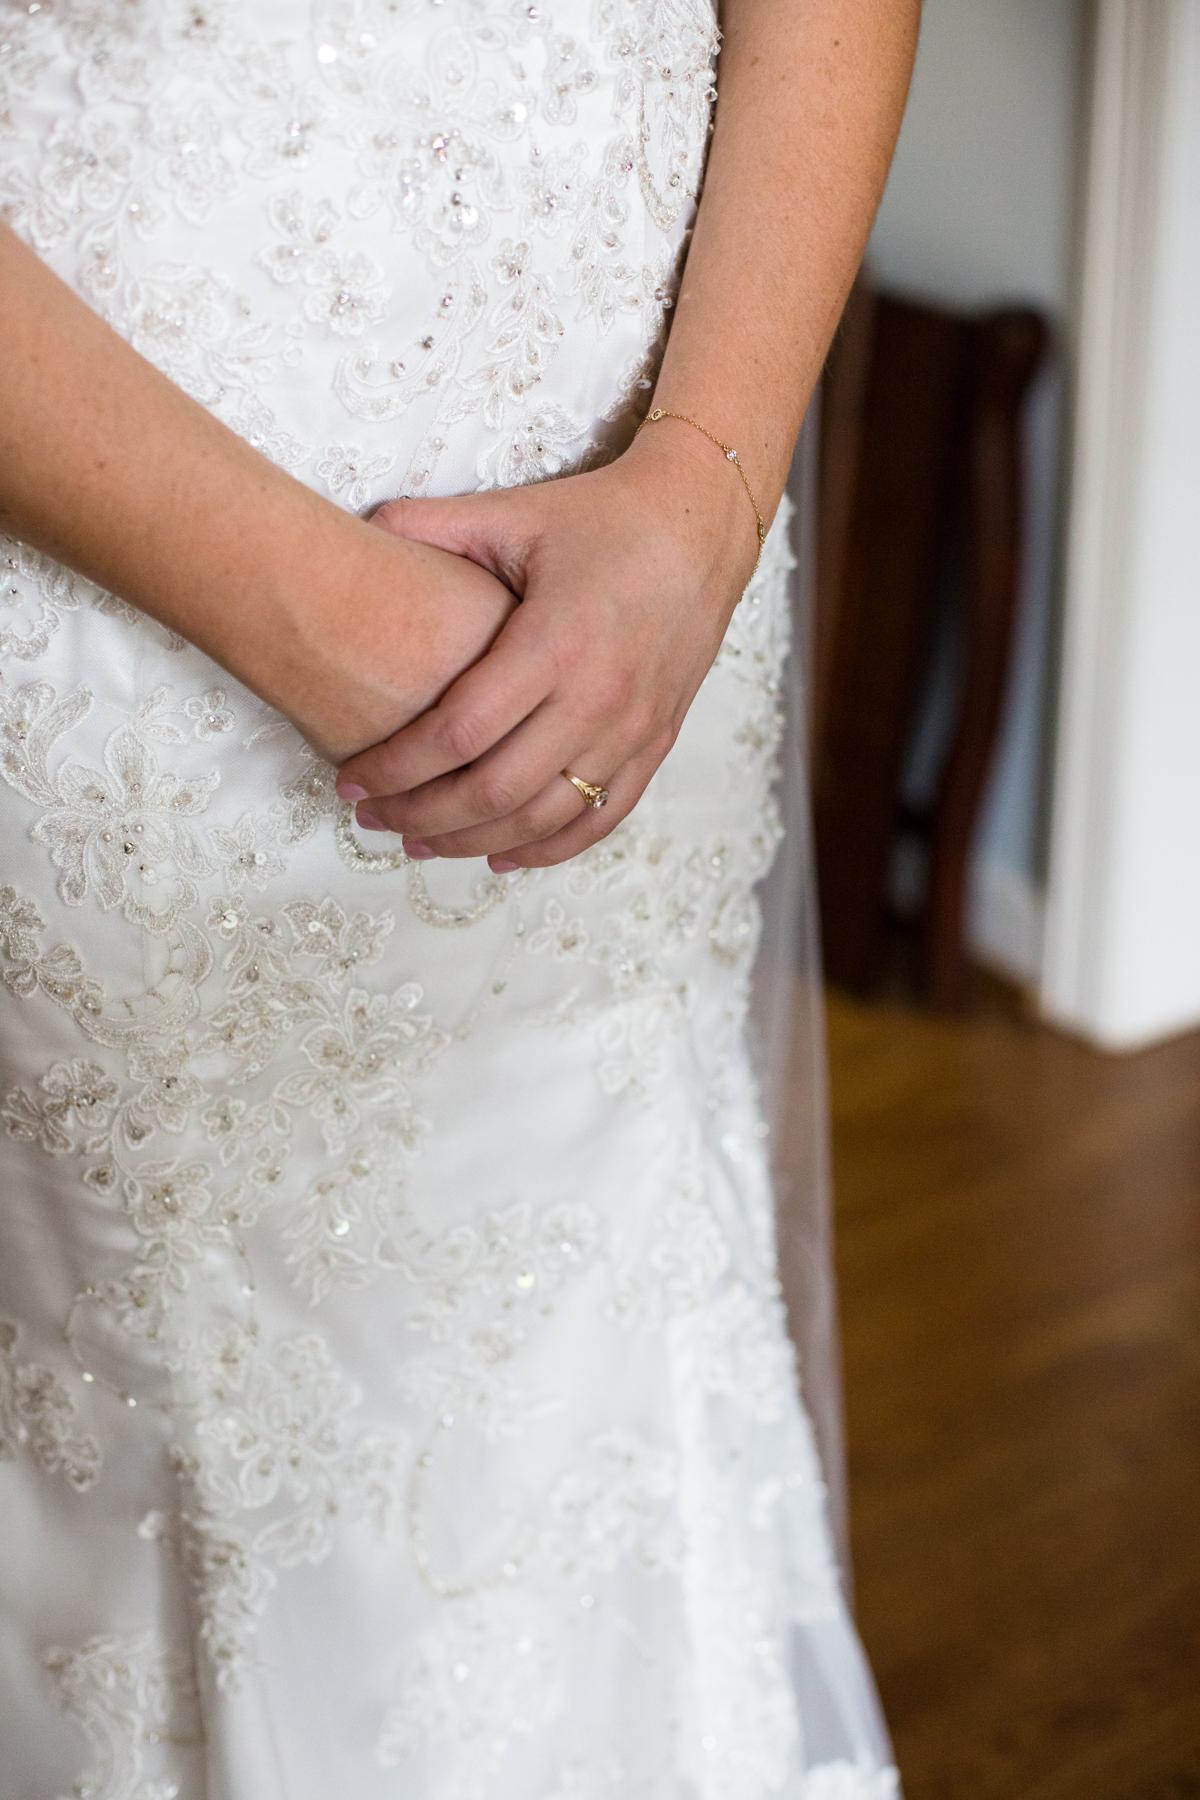 Kelli-and-Matt-Nashville-Wedding-Sneak-Peak-0080.jpg